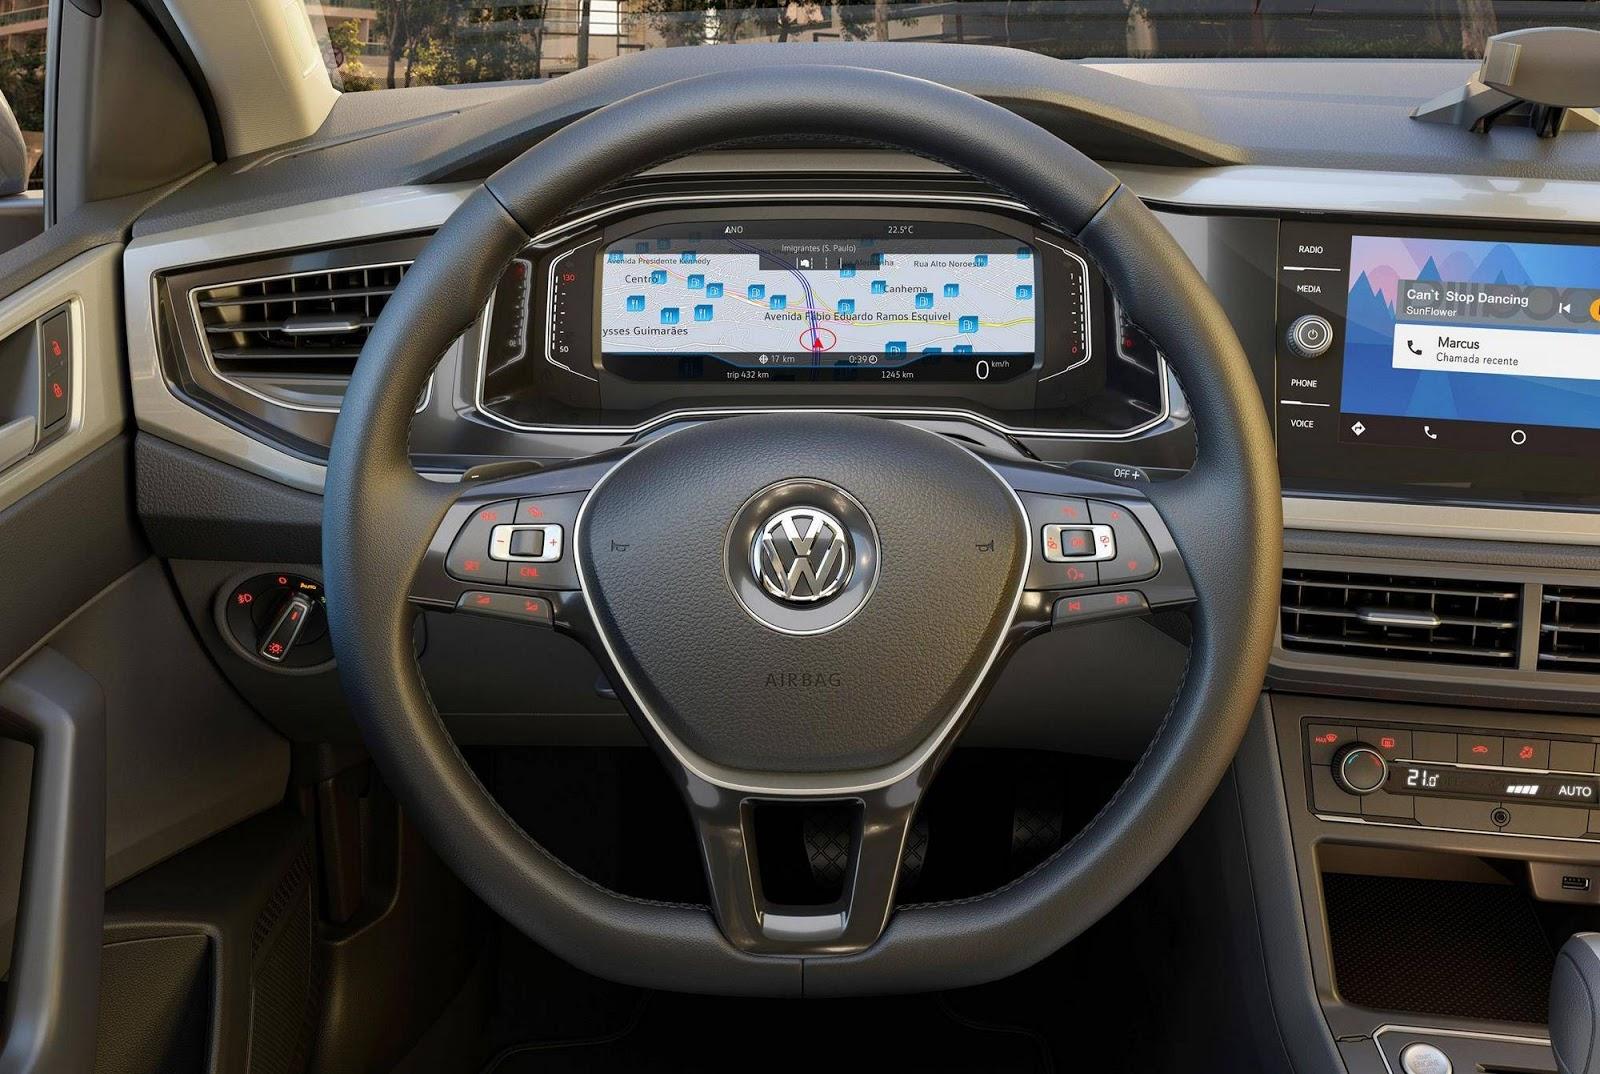 2018 VW Virtus (Polo based sedan) steering wheel